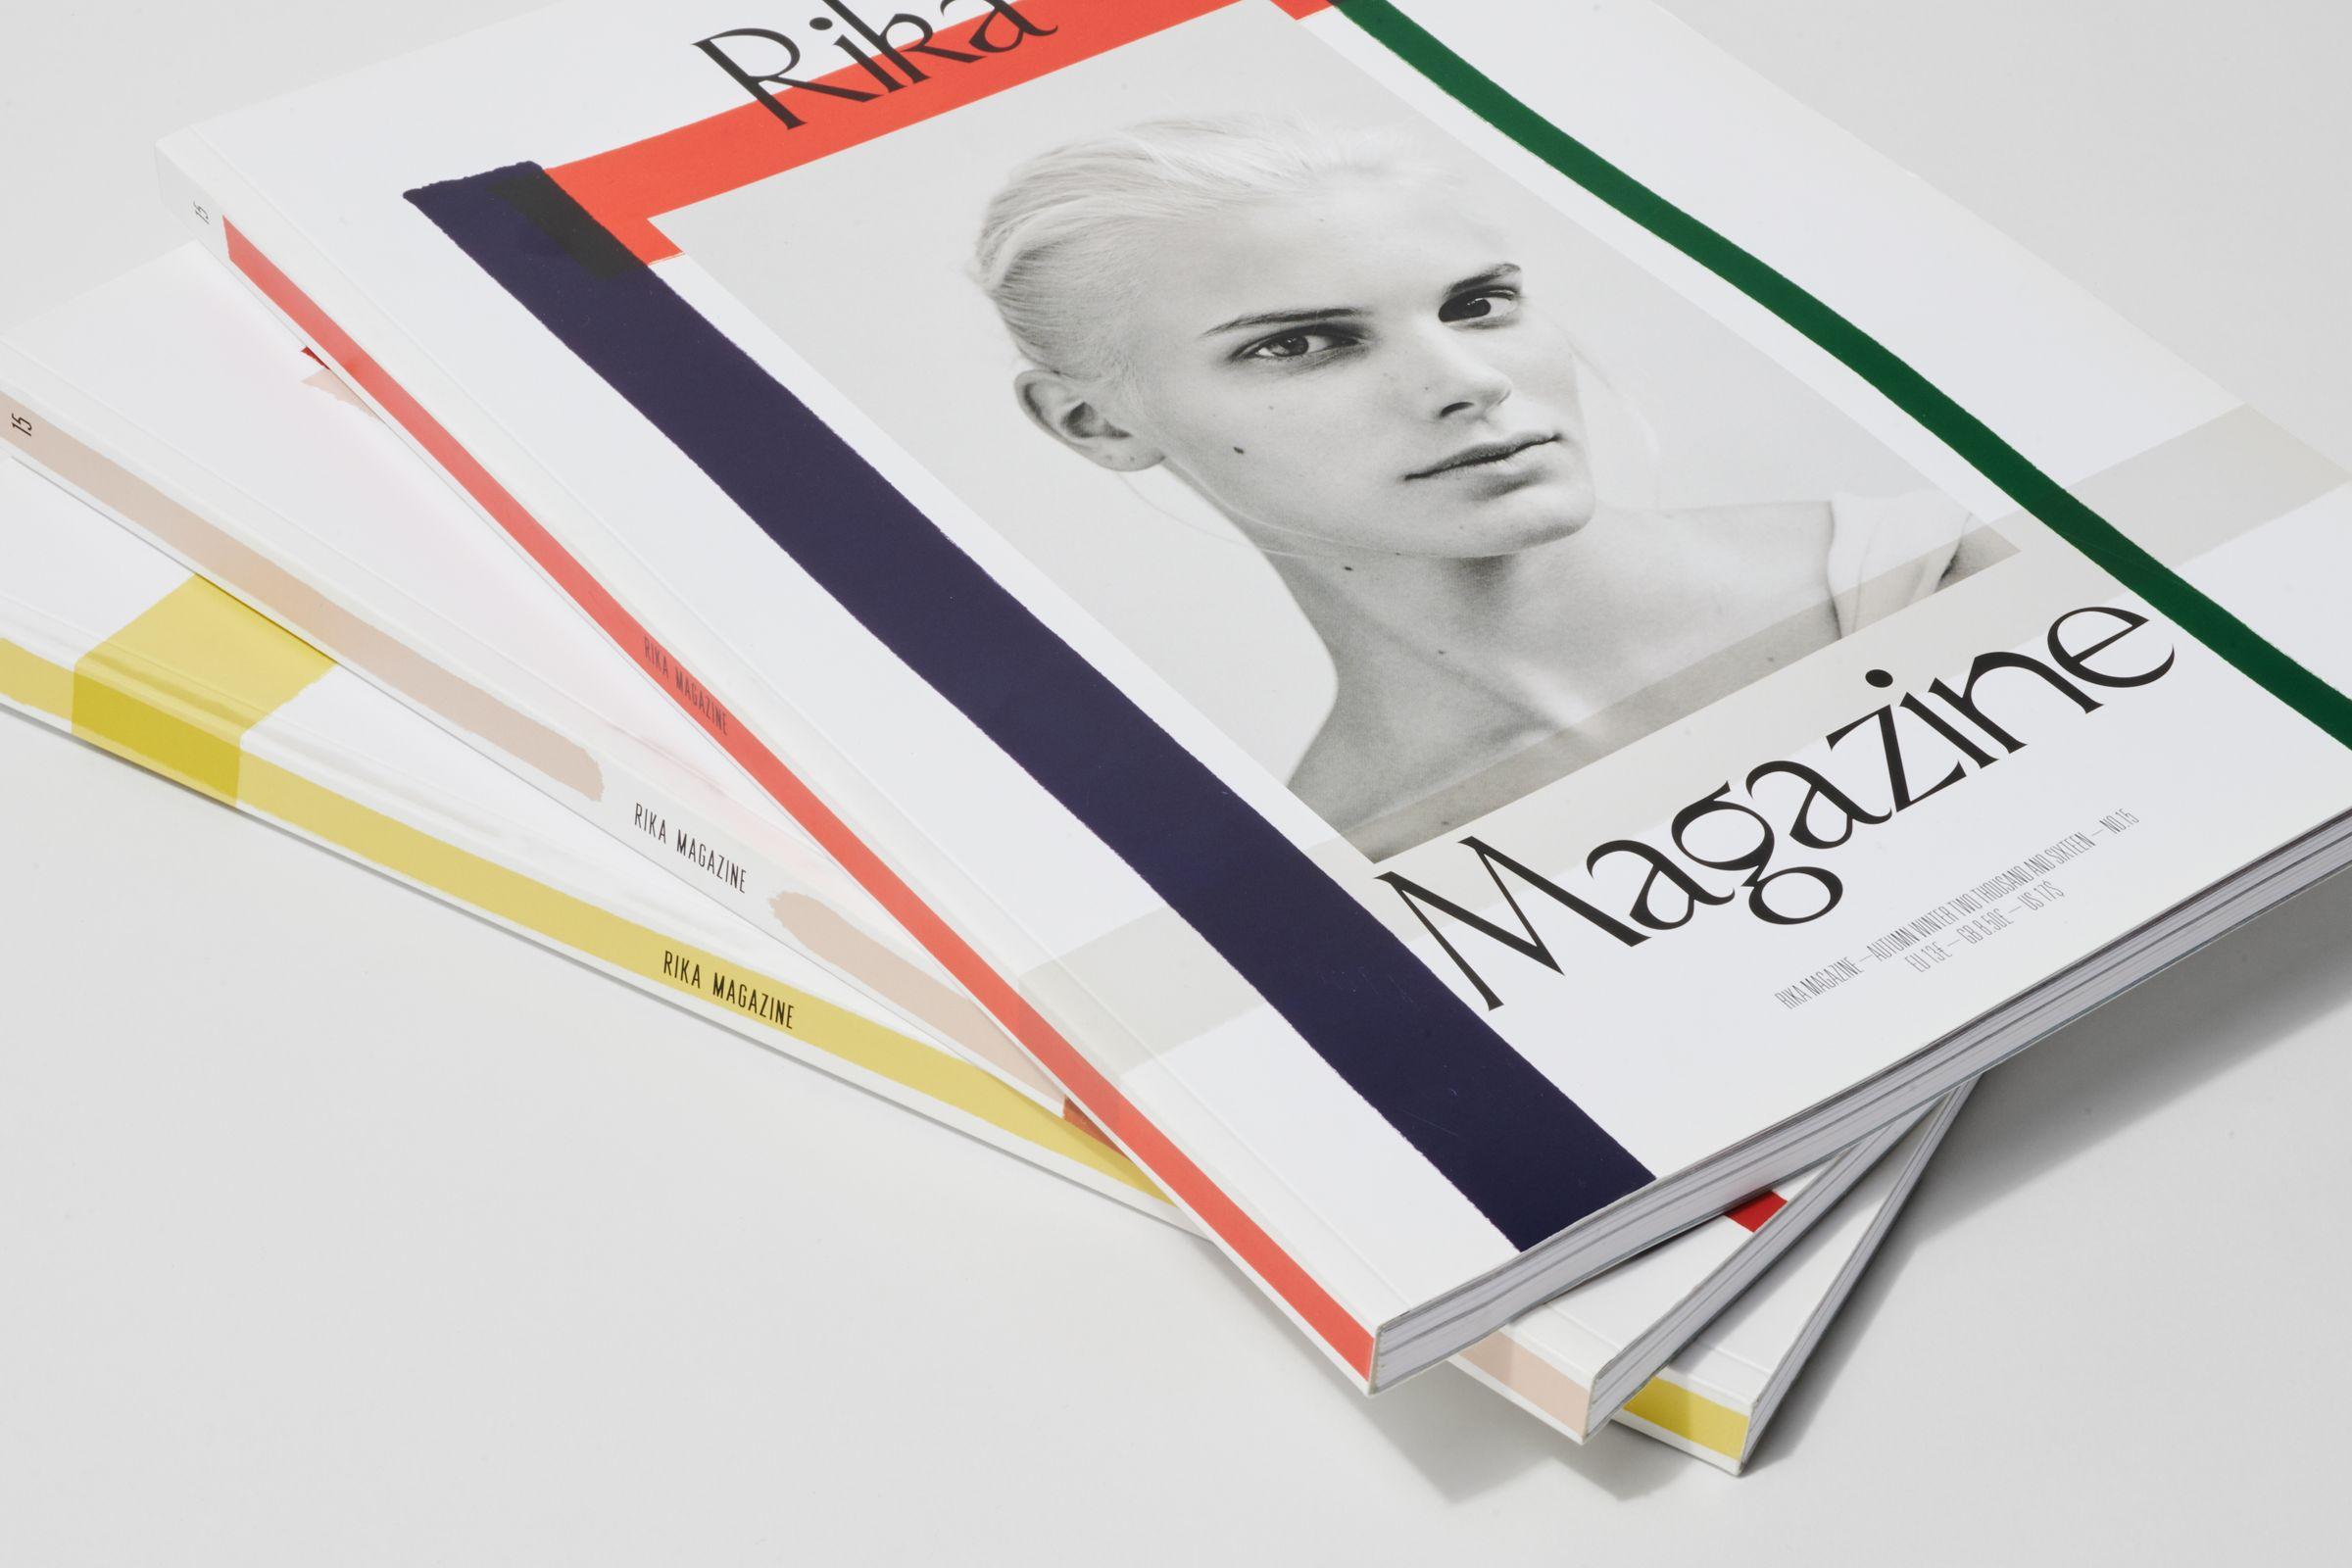 Rika Magazine issue no. 15 cover design